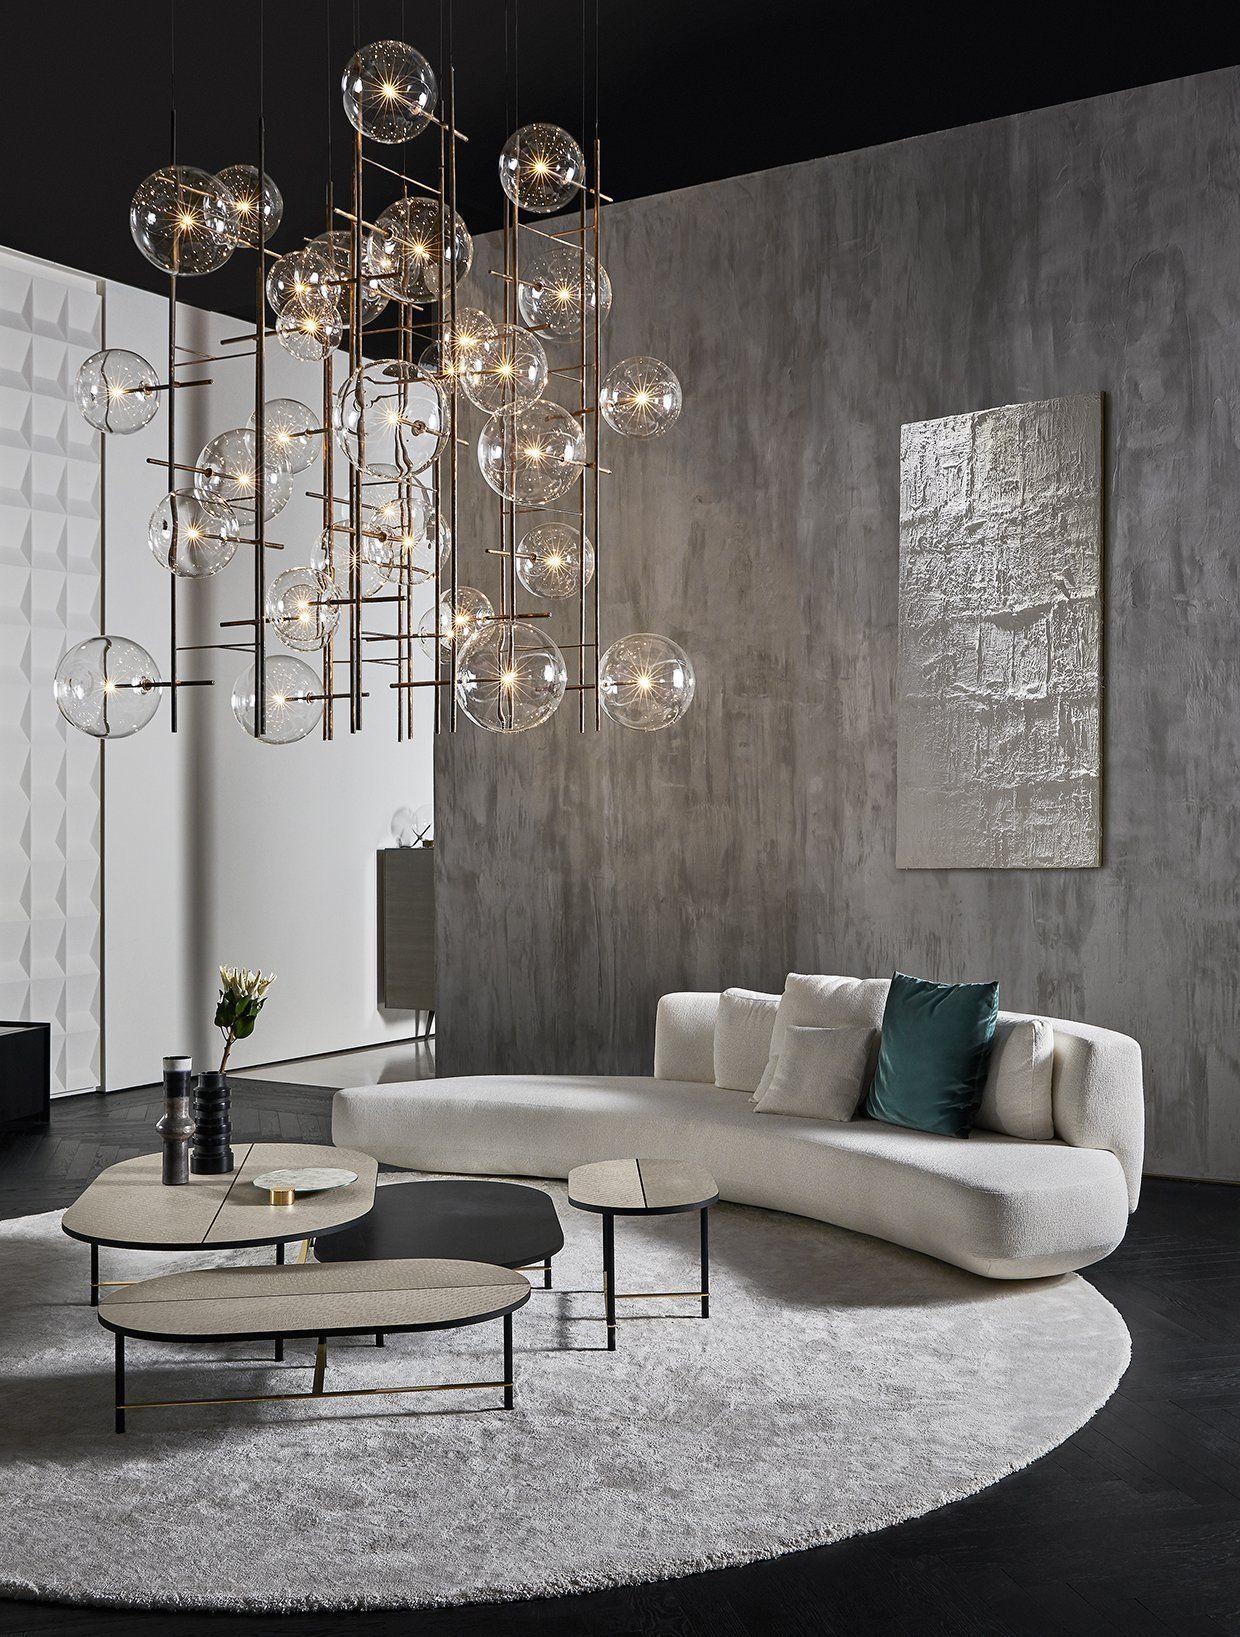 Top 10 Luxury Outdoor Furniture Brands Elegant Living Room Minimalist Living Room Design Minimalist Living Room